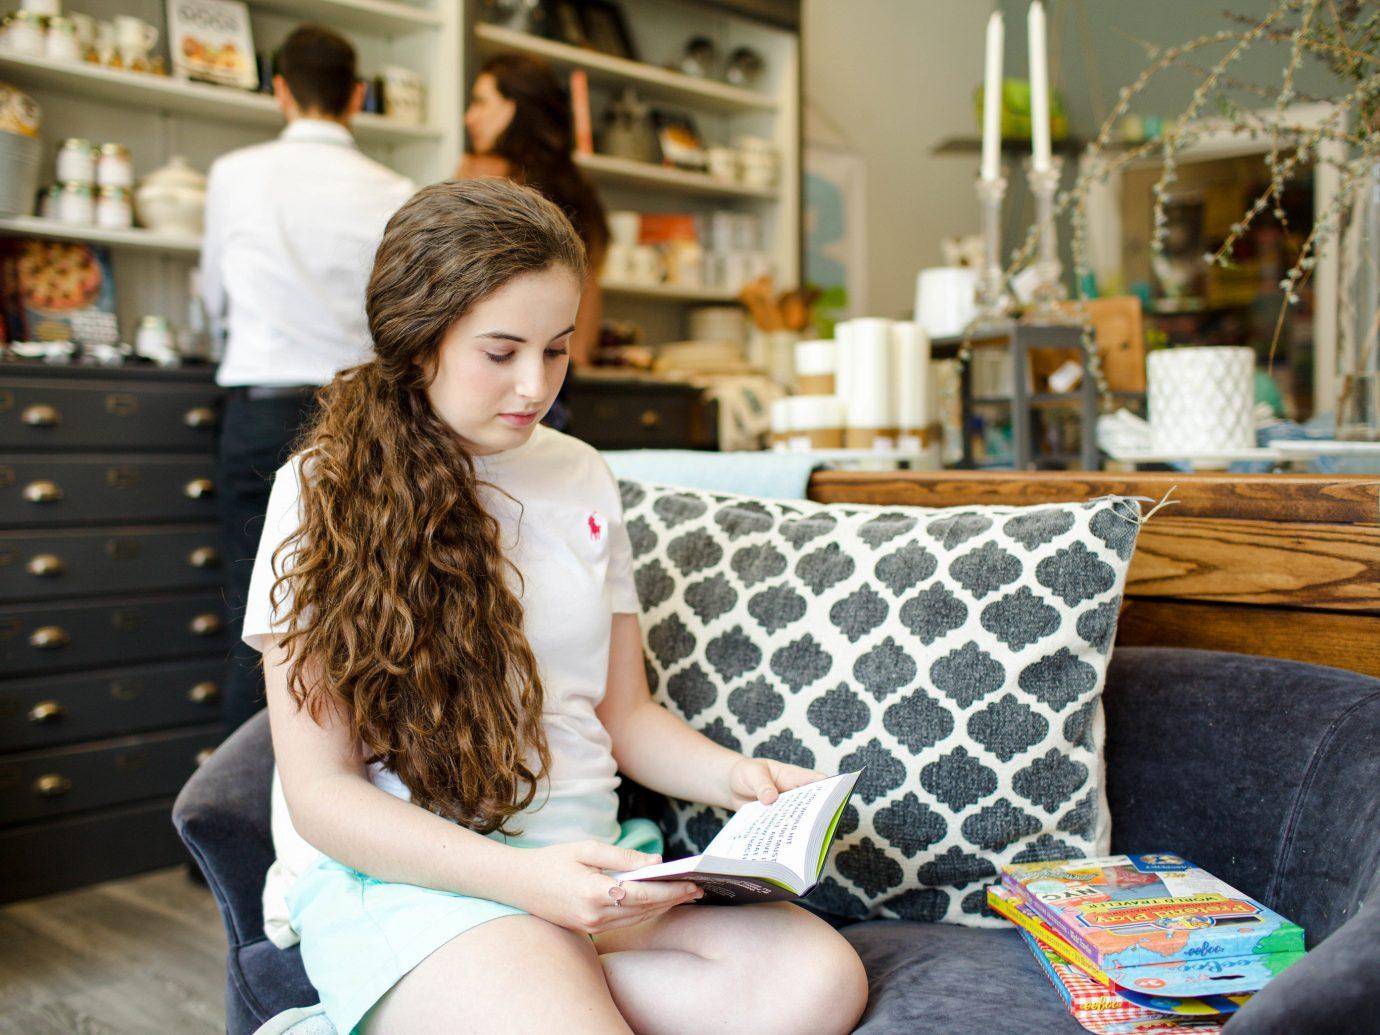 Boutique Hotels Fall Hotels Outdoors + Adventure Trip Ideas Weekend Getaways person sitting indoor room girl brown hair